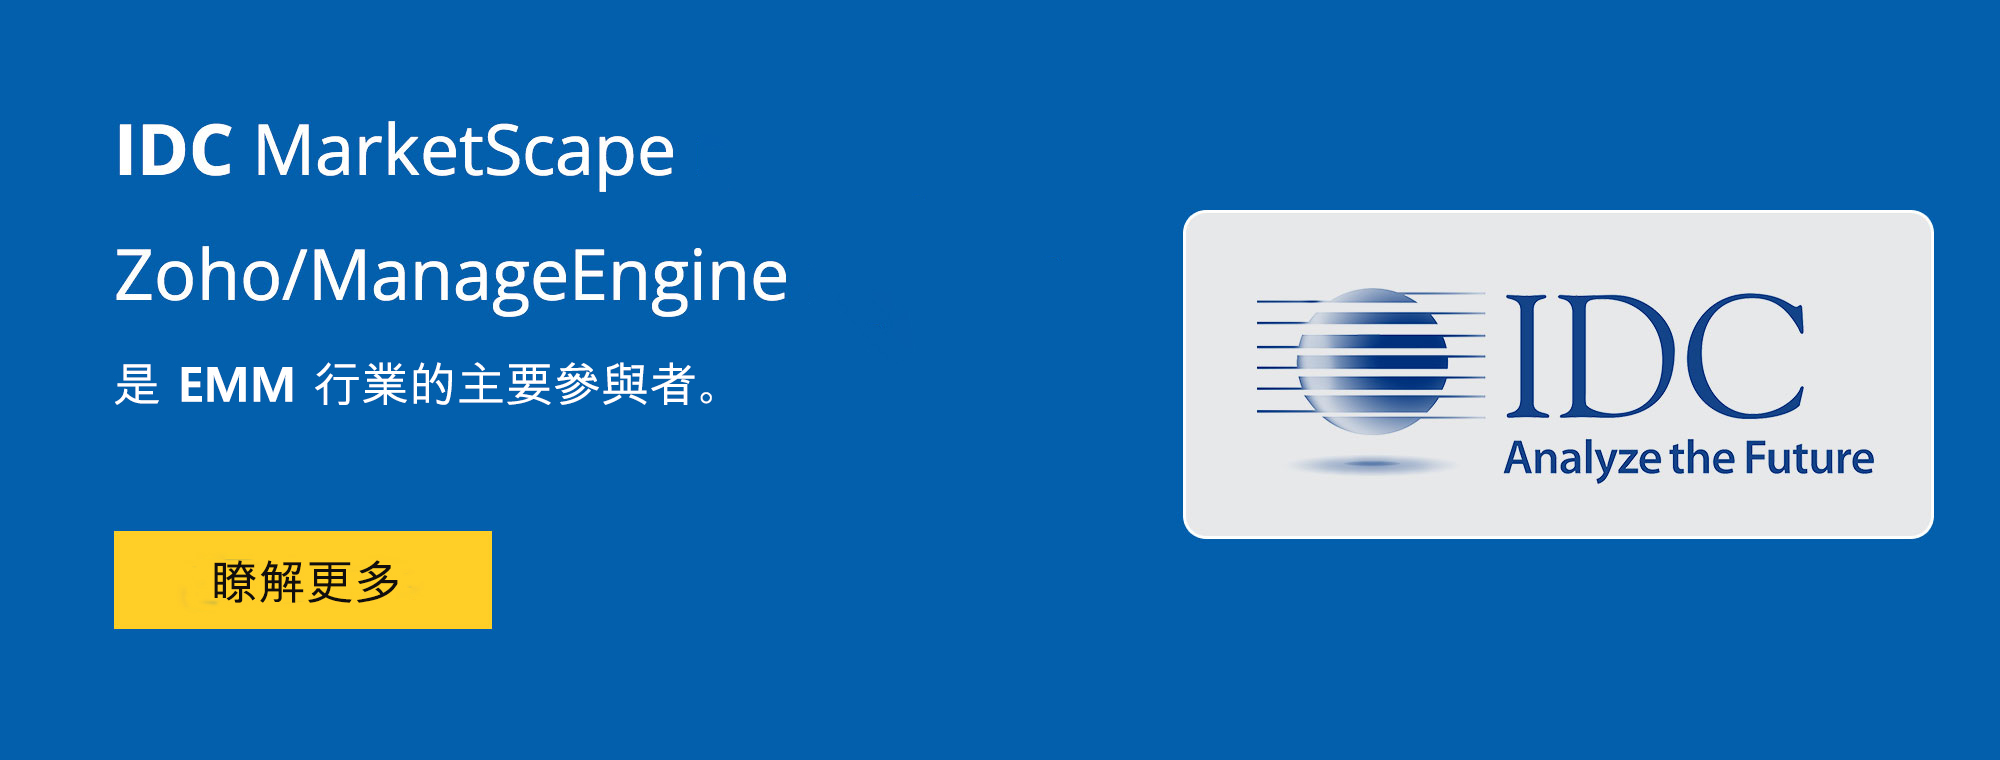 IDC MarketSpace Zoho/ManageEngine 是 EMM 行業的主要參與者。